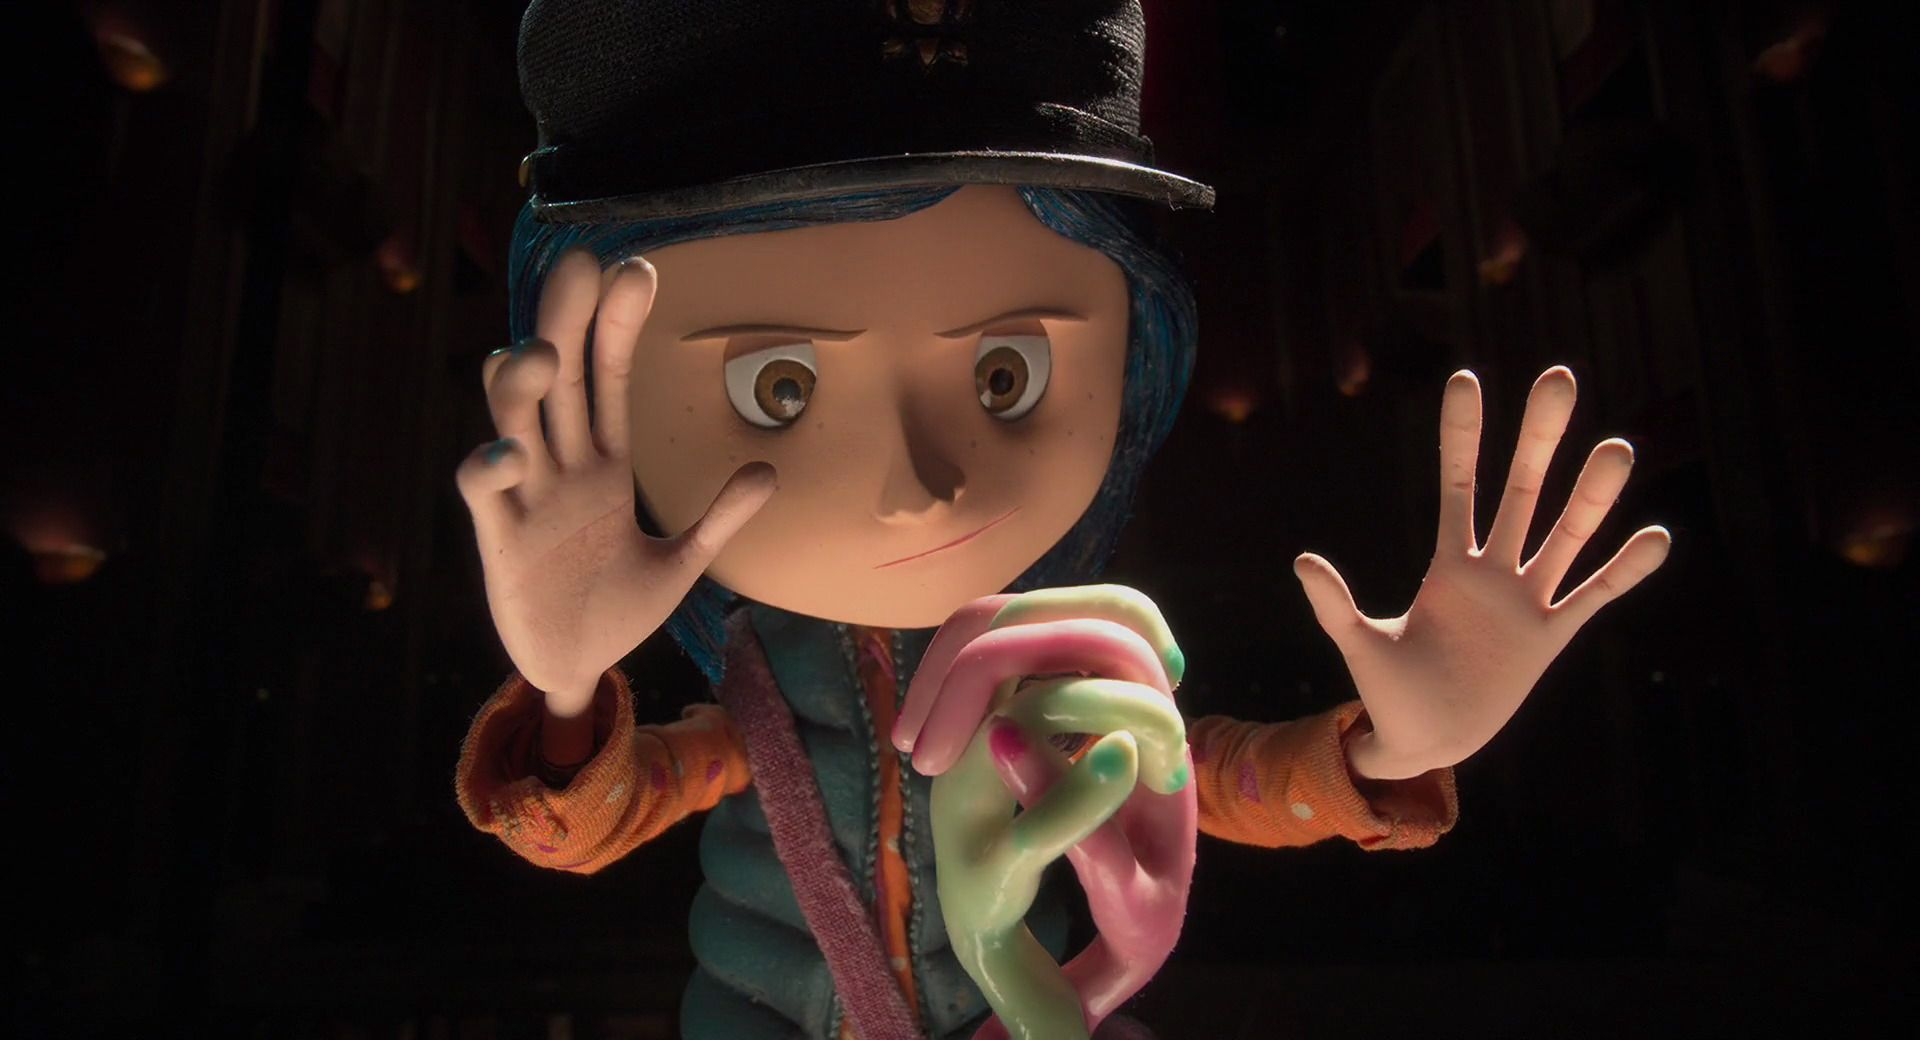 Coraline 2009 Animation Screencaps In 2020 Coraline Coraline Jones Animation